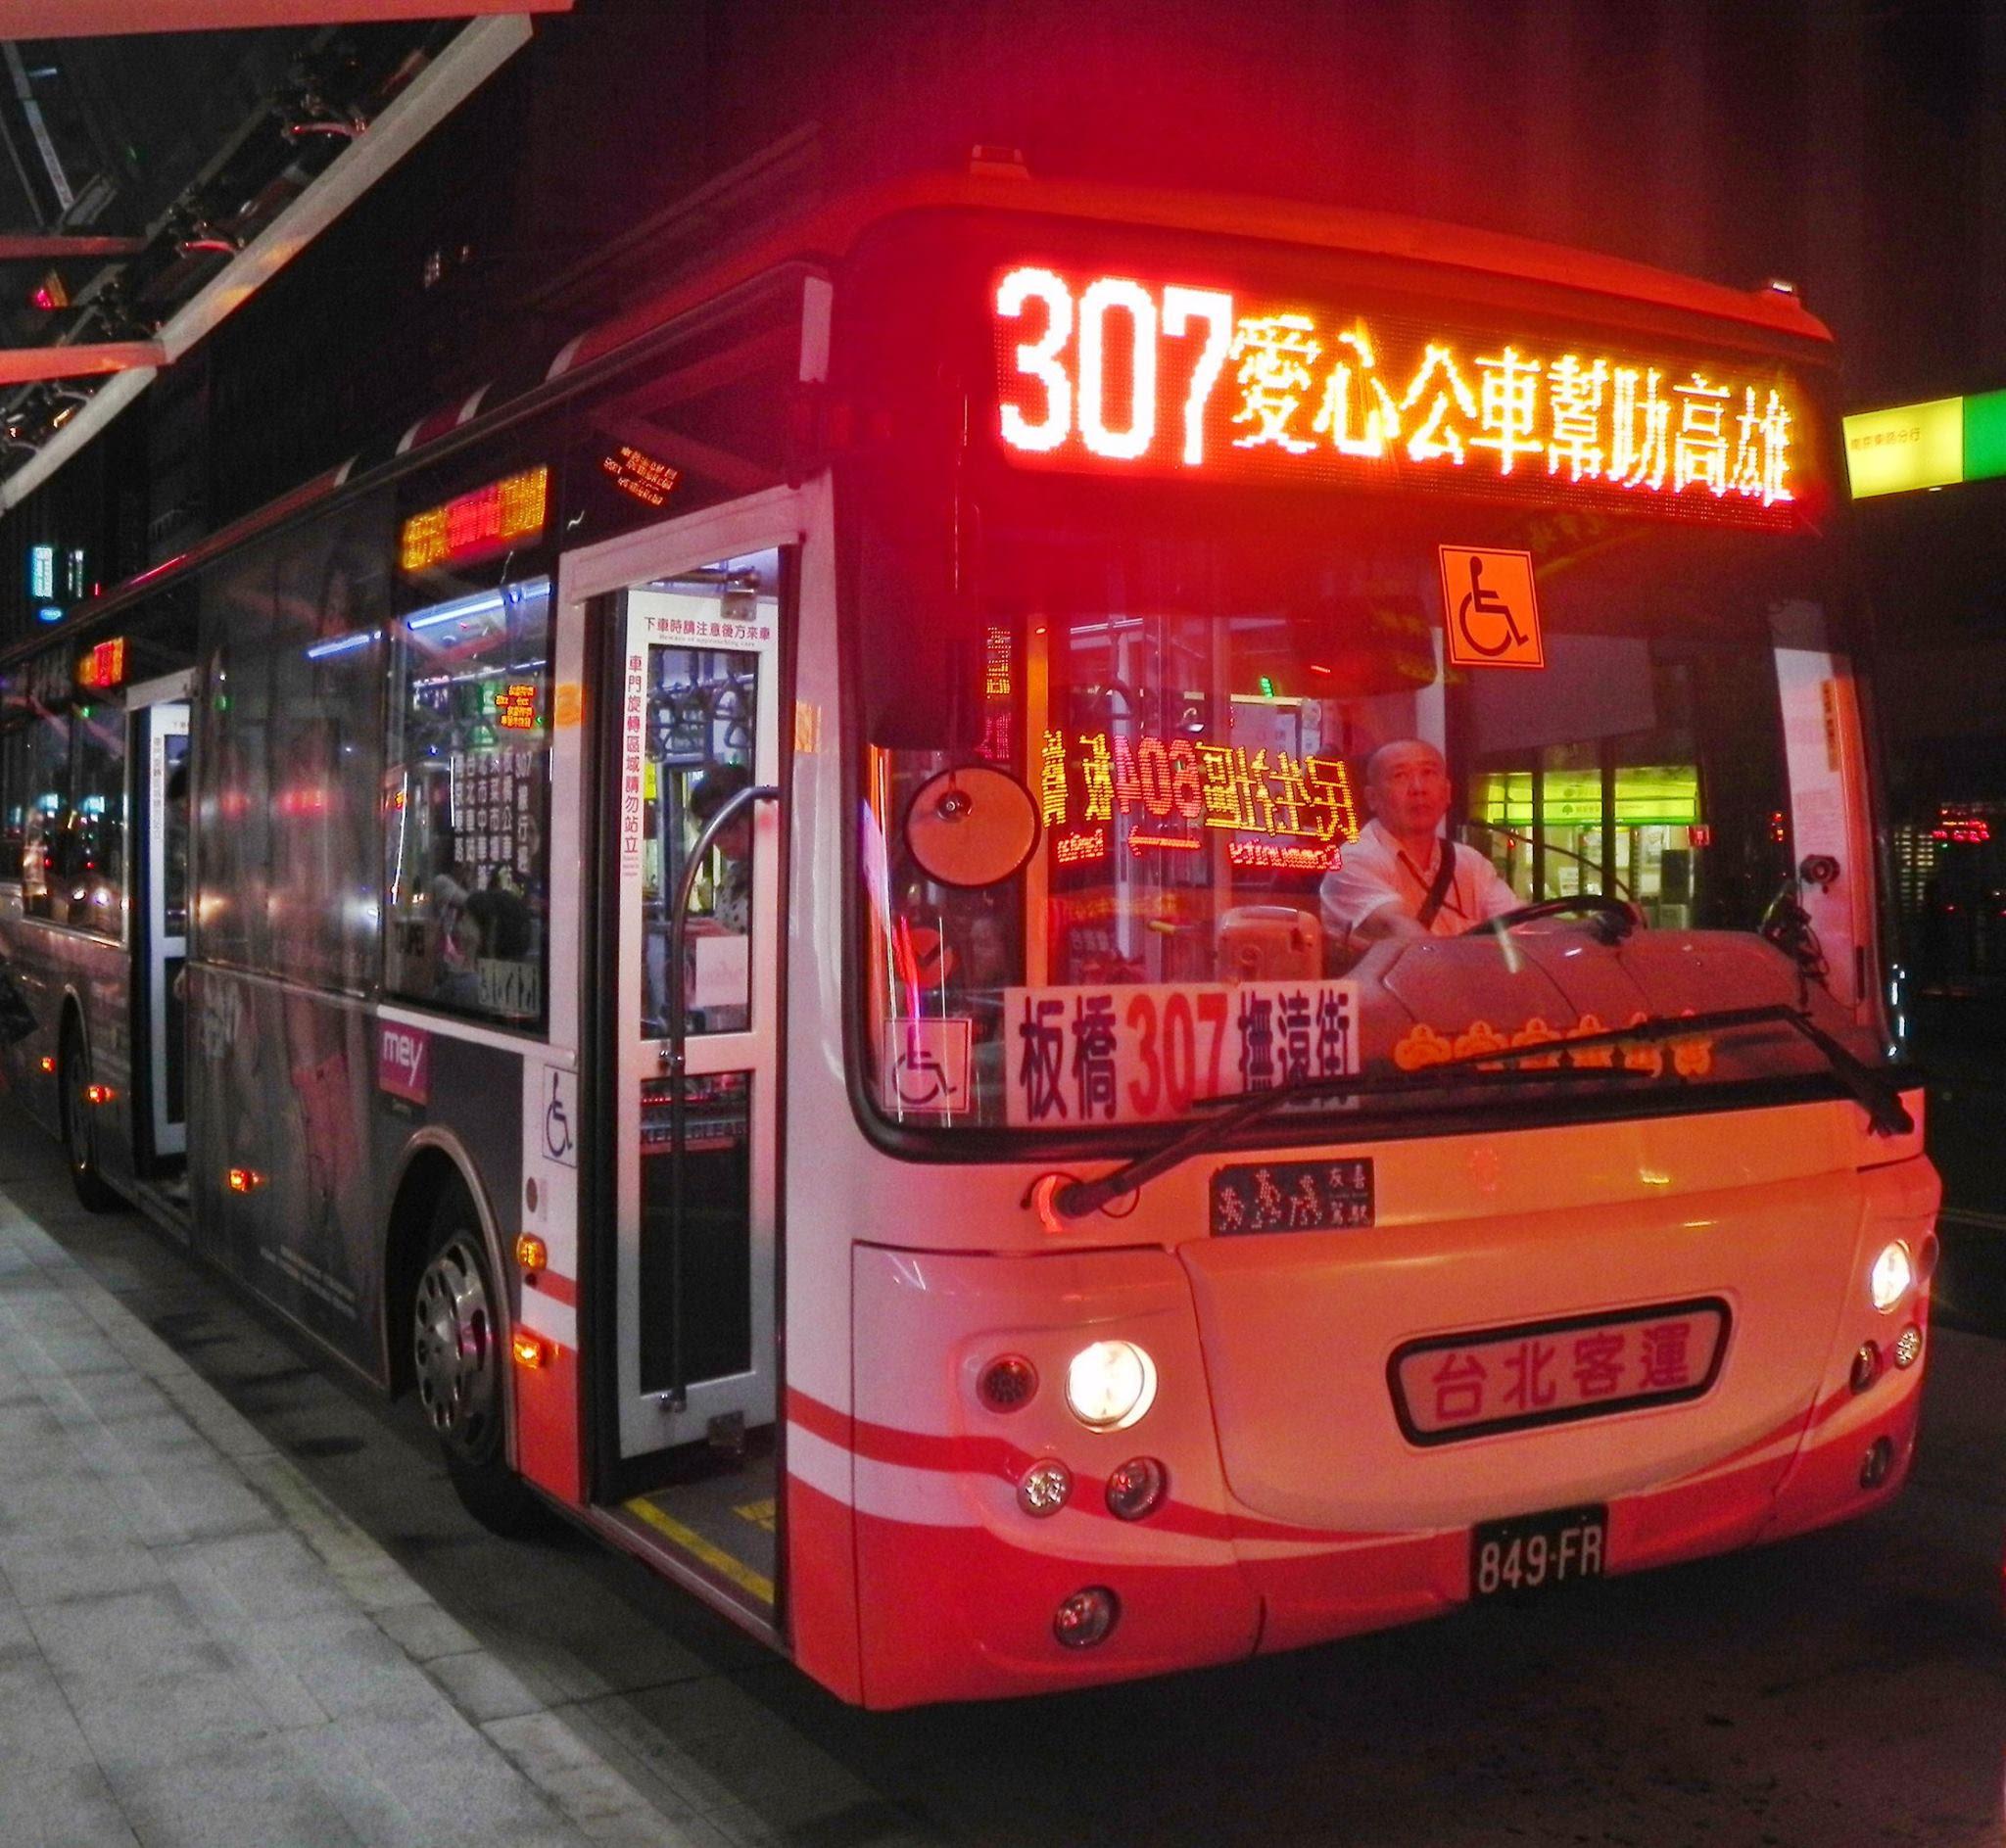 [Gossiping][新聞] 307公車5日義跑 助高雄災民 by Operon (歐普龍)